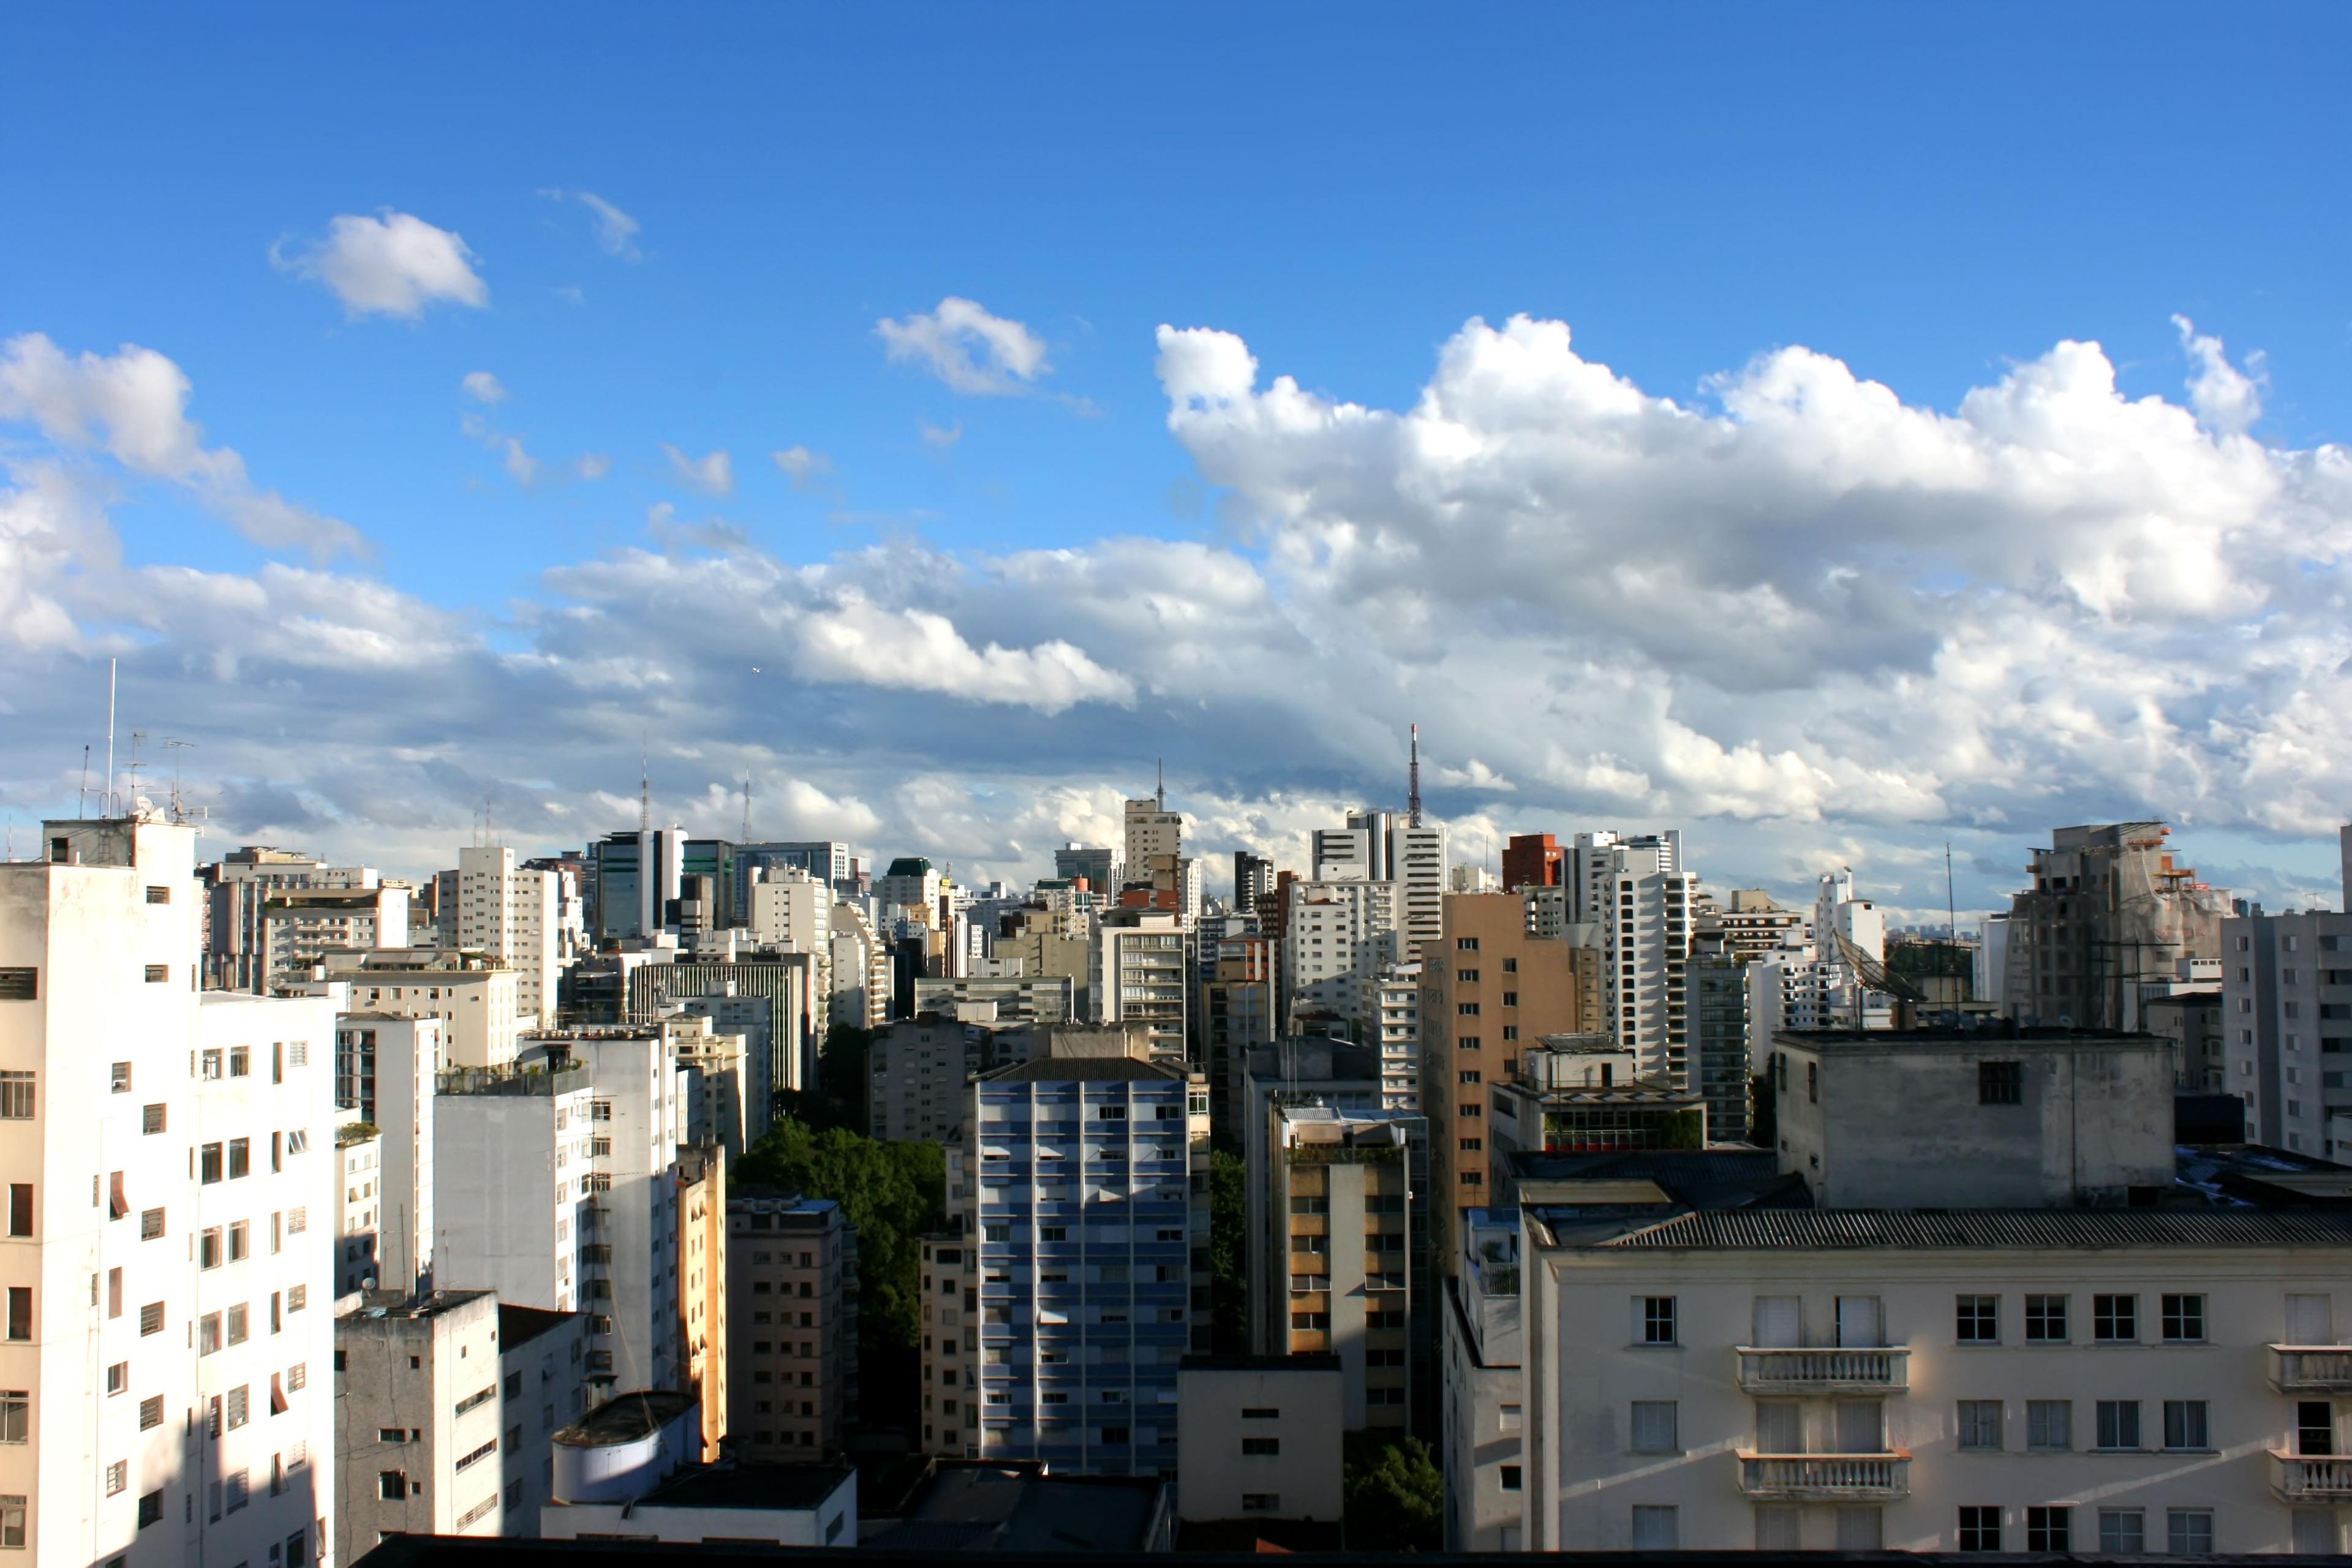 Consolação, São Paulo, São Paulo  (Bundesstaat), Brasilien